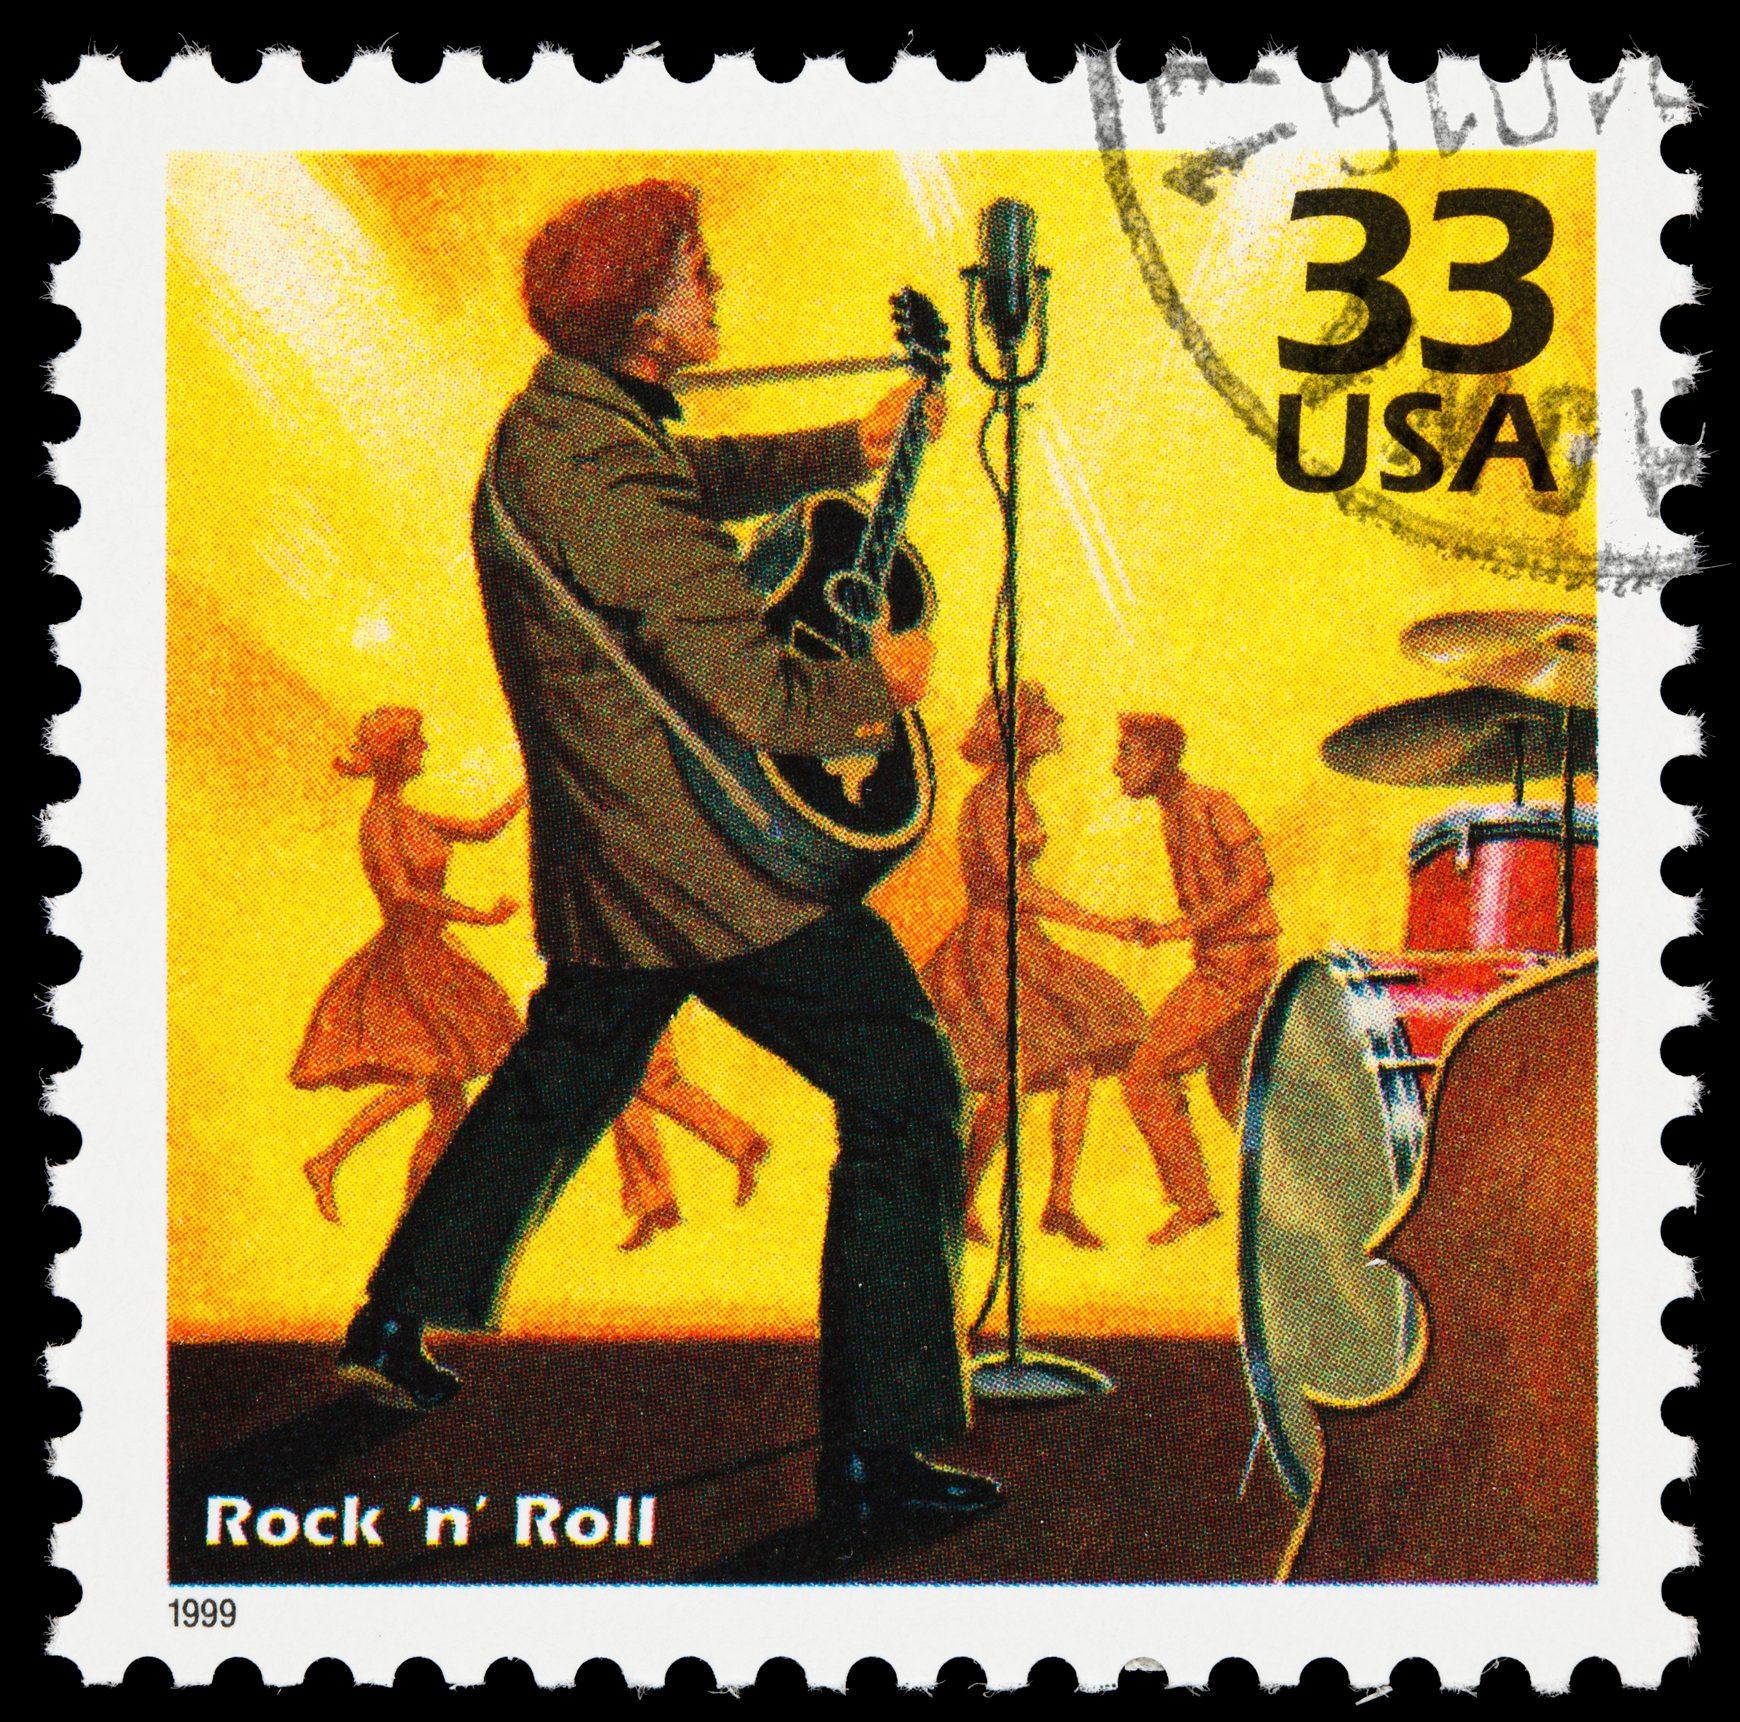 Rock 'n' Roll postage stamp